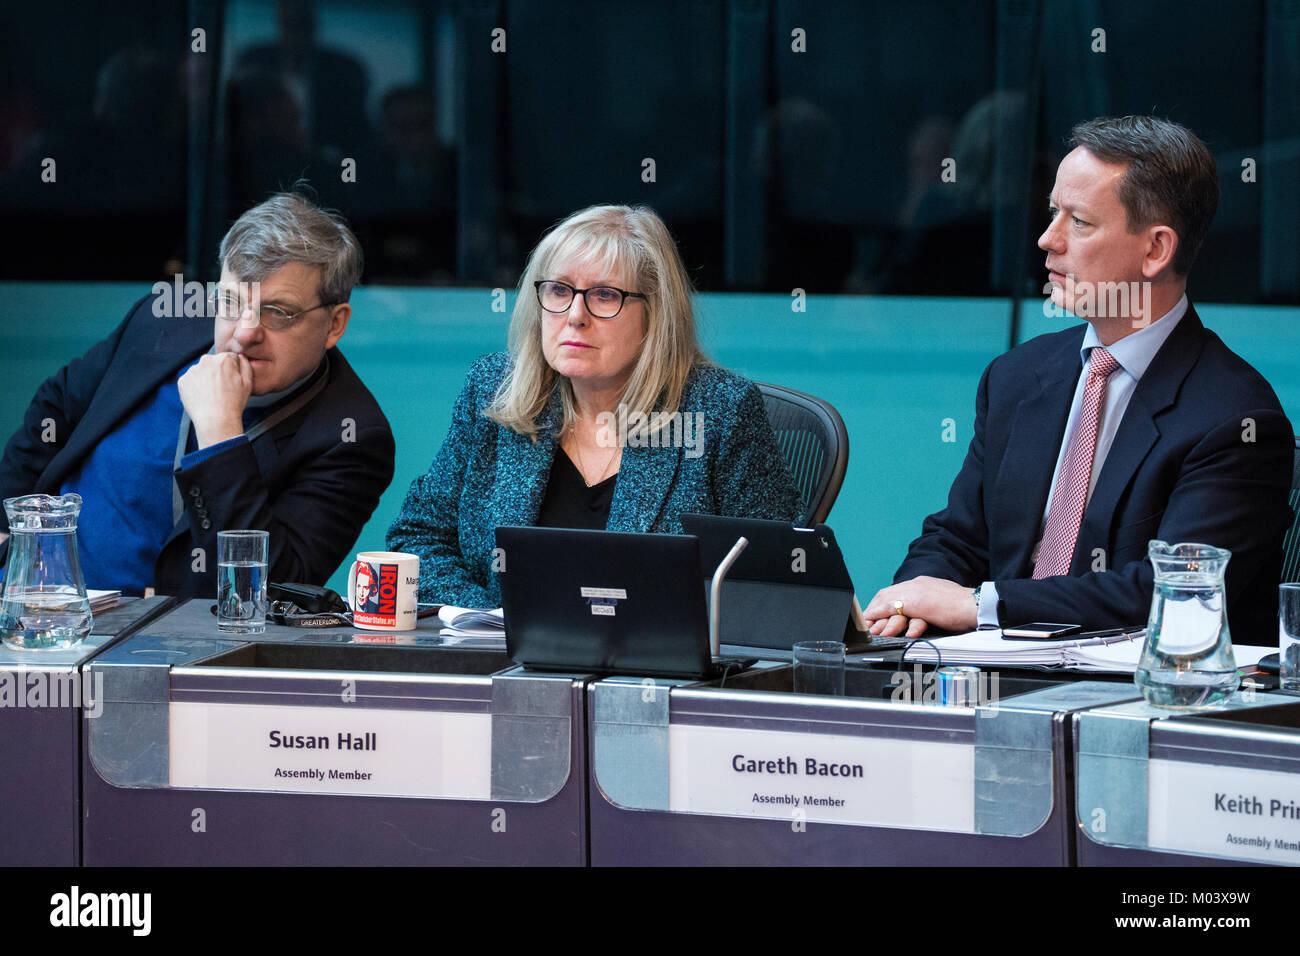 London, UK. 18th Jan, 2018. Tony Devenish, Susan Hall and Gareth Bacon, Conservative London Assembly Members, listen - Stock Image